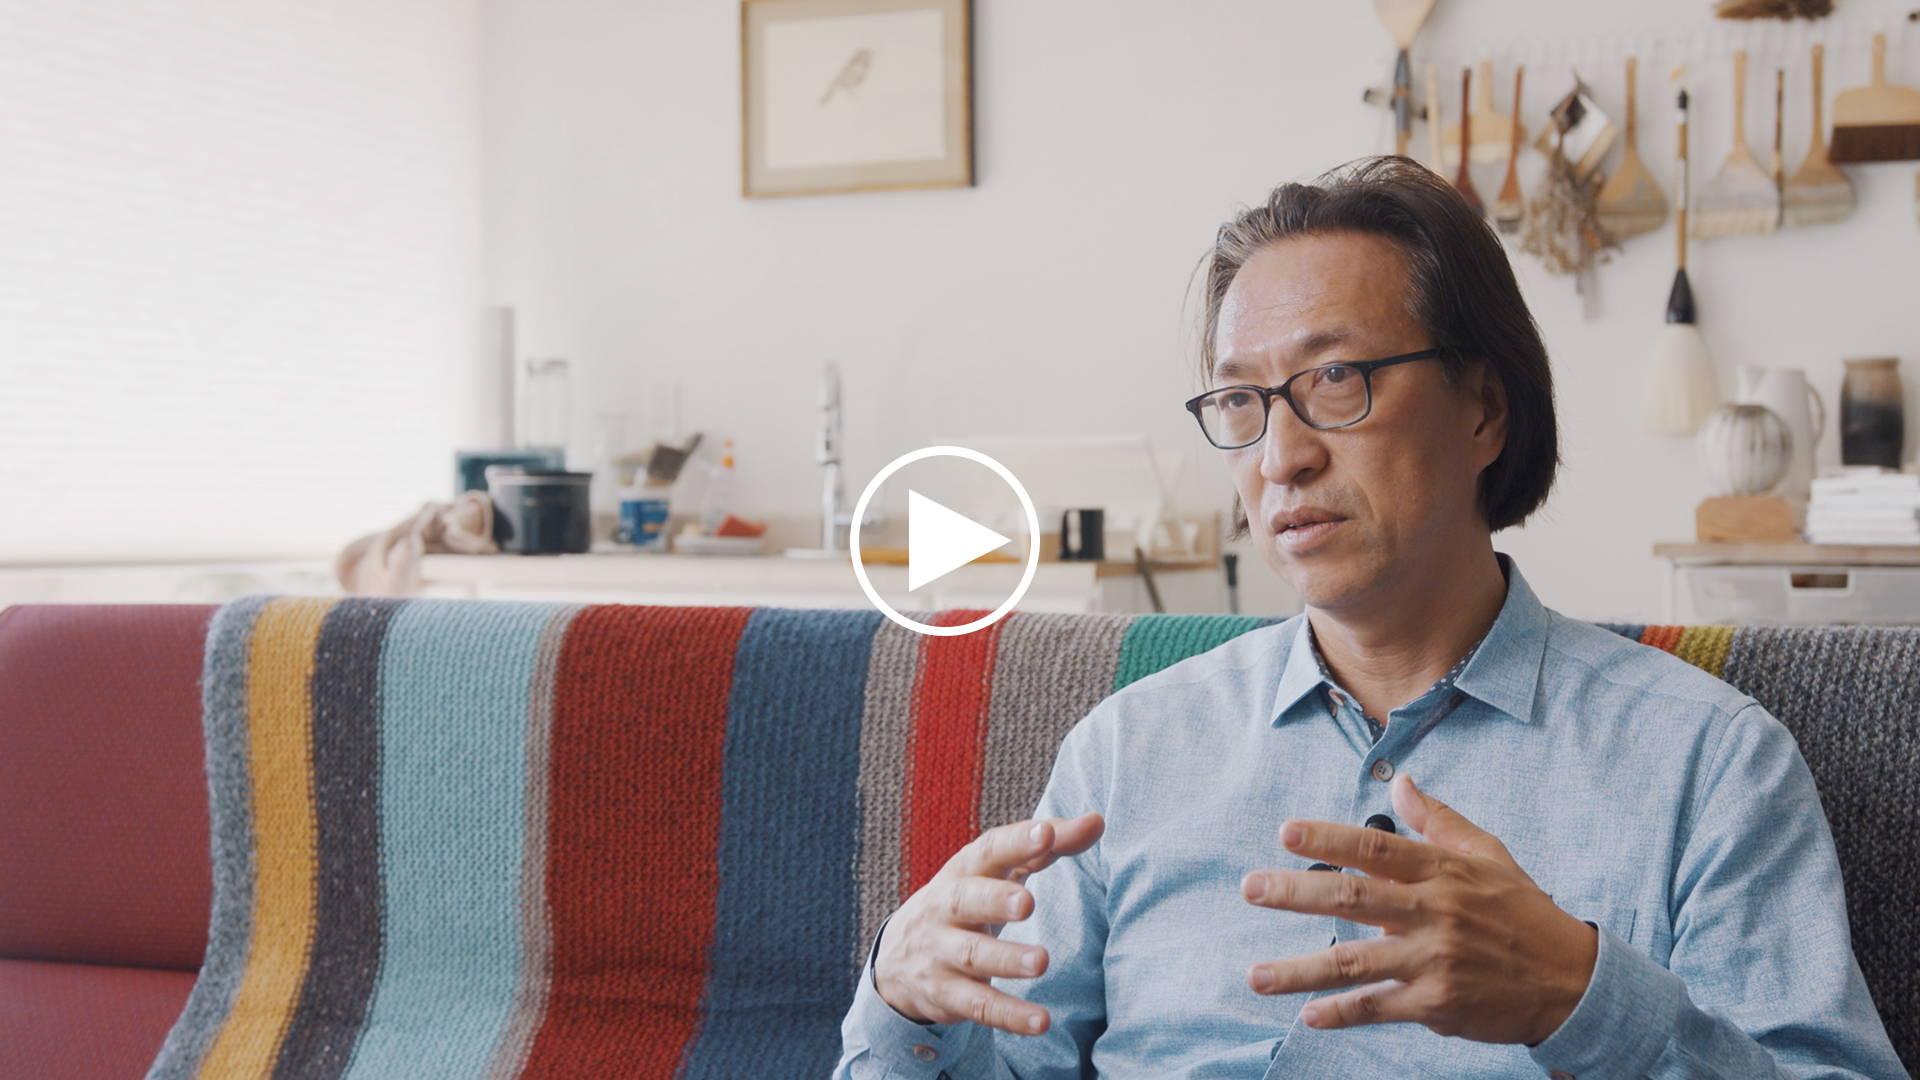 Picture of Makoto Fujimura that links to a YouTube video titled: Makoto Fujimura | Art and Faith